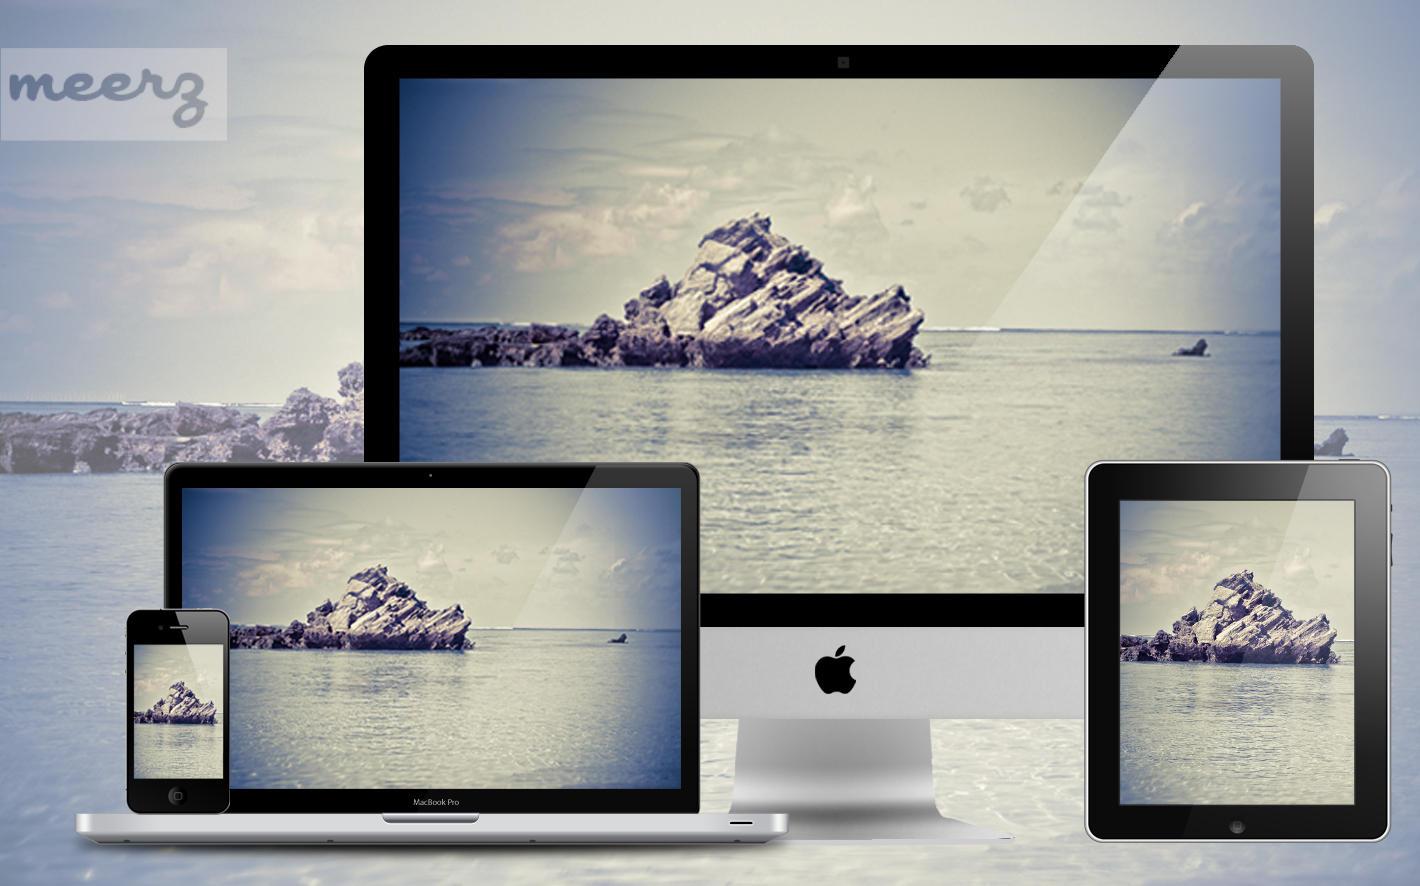 Wallpaper 1 - Off Lord Howe by xmeerzx